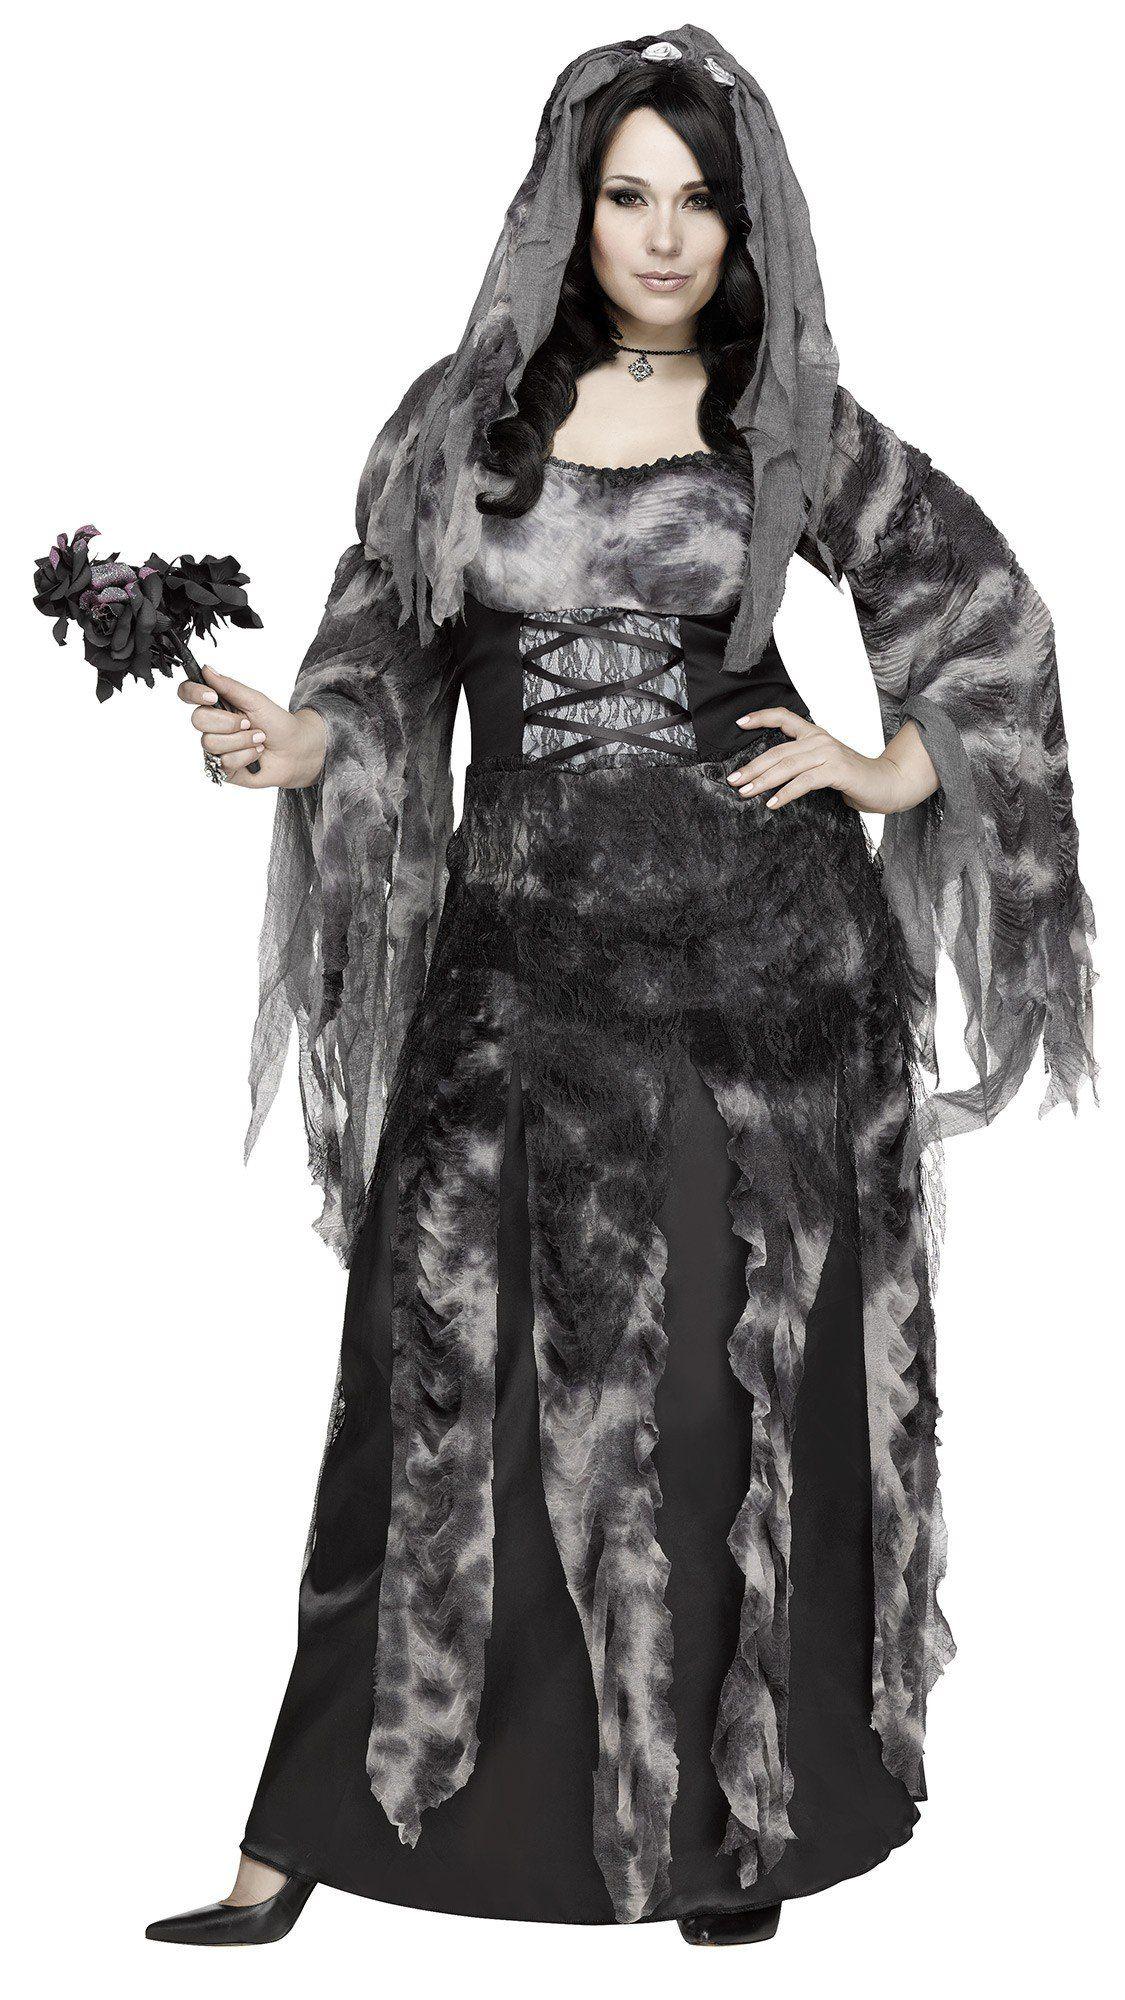 Ladies Zombie Black Widow Bride  Costume Victorian Ladies Halloween Fancy Dress